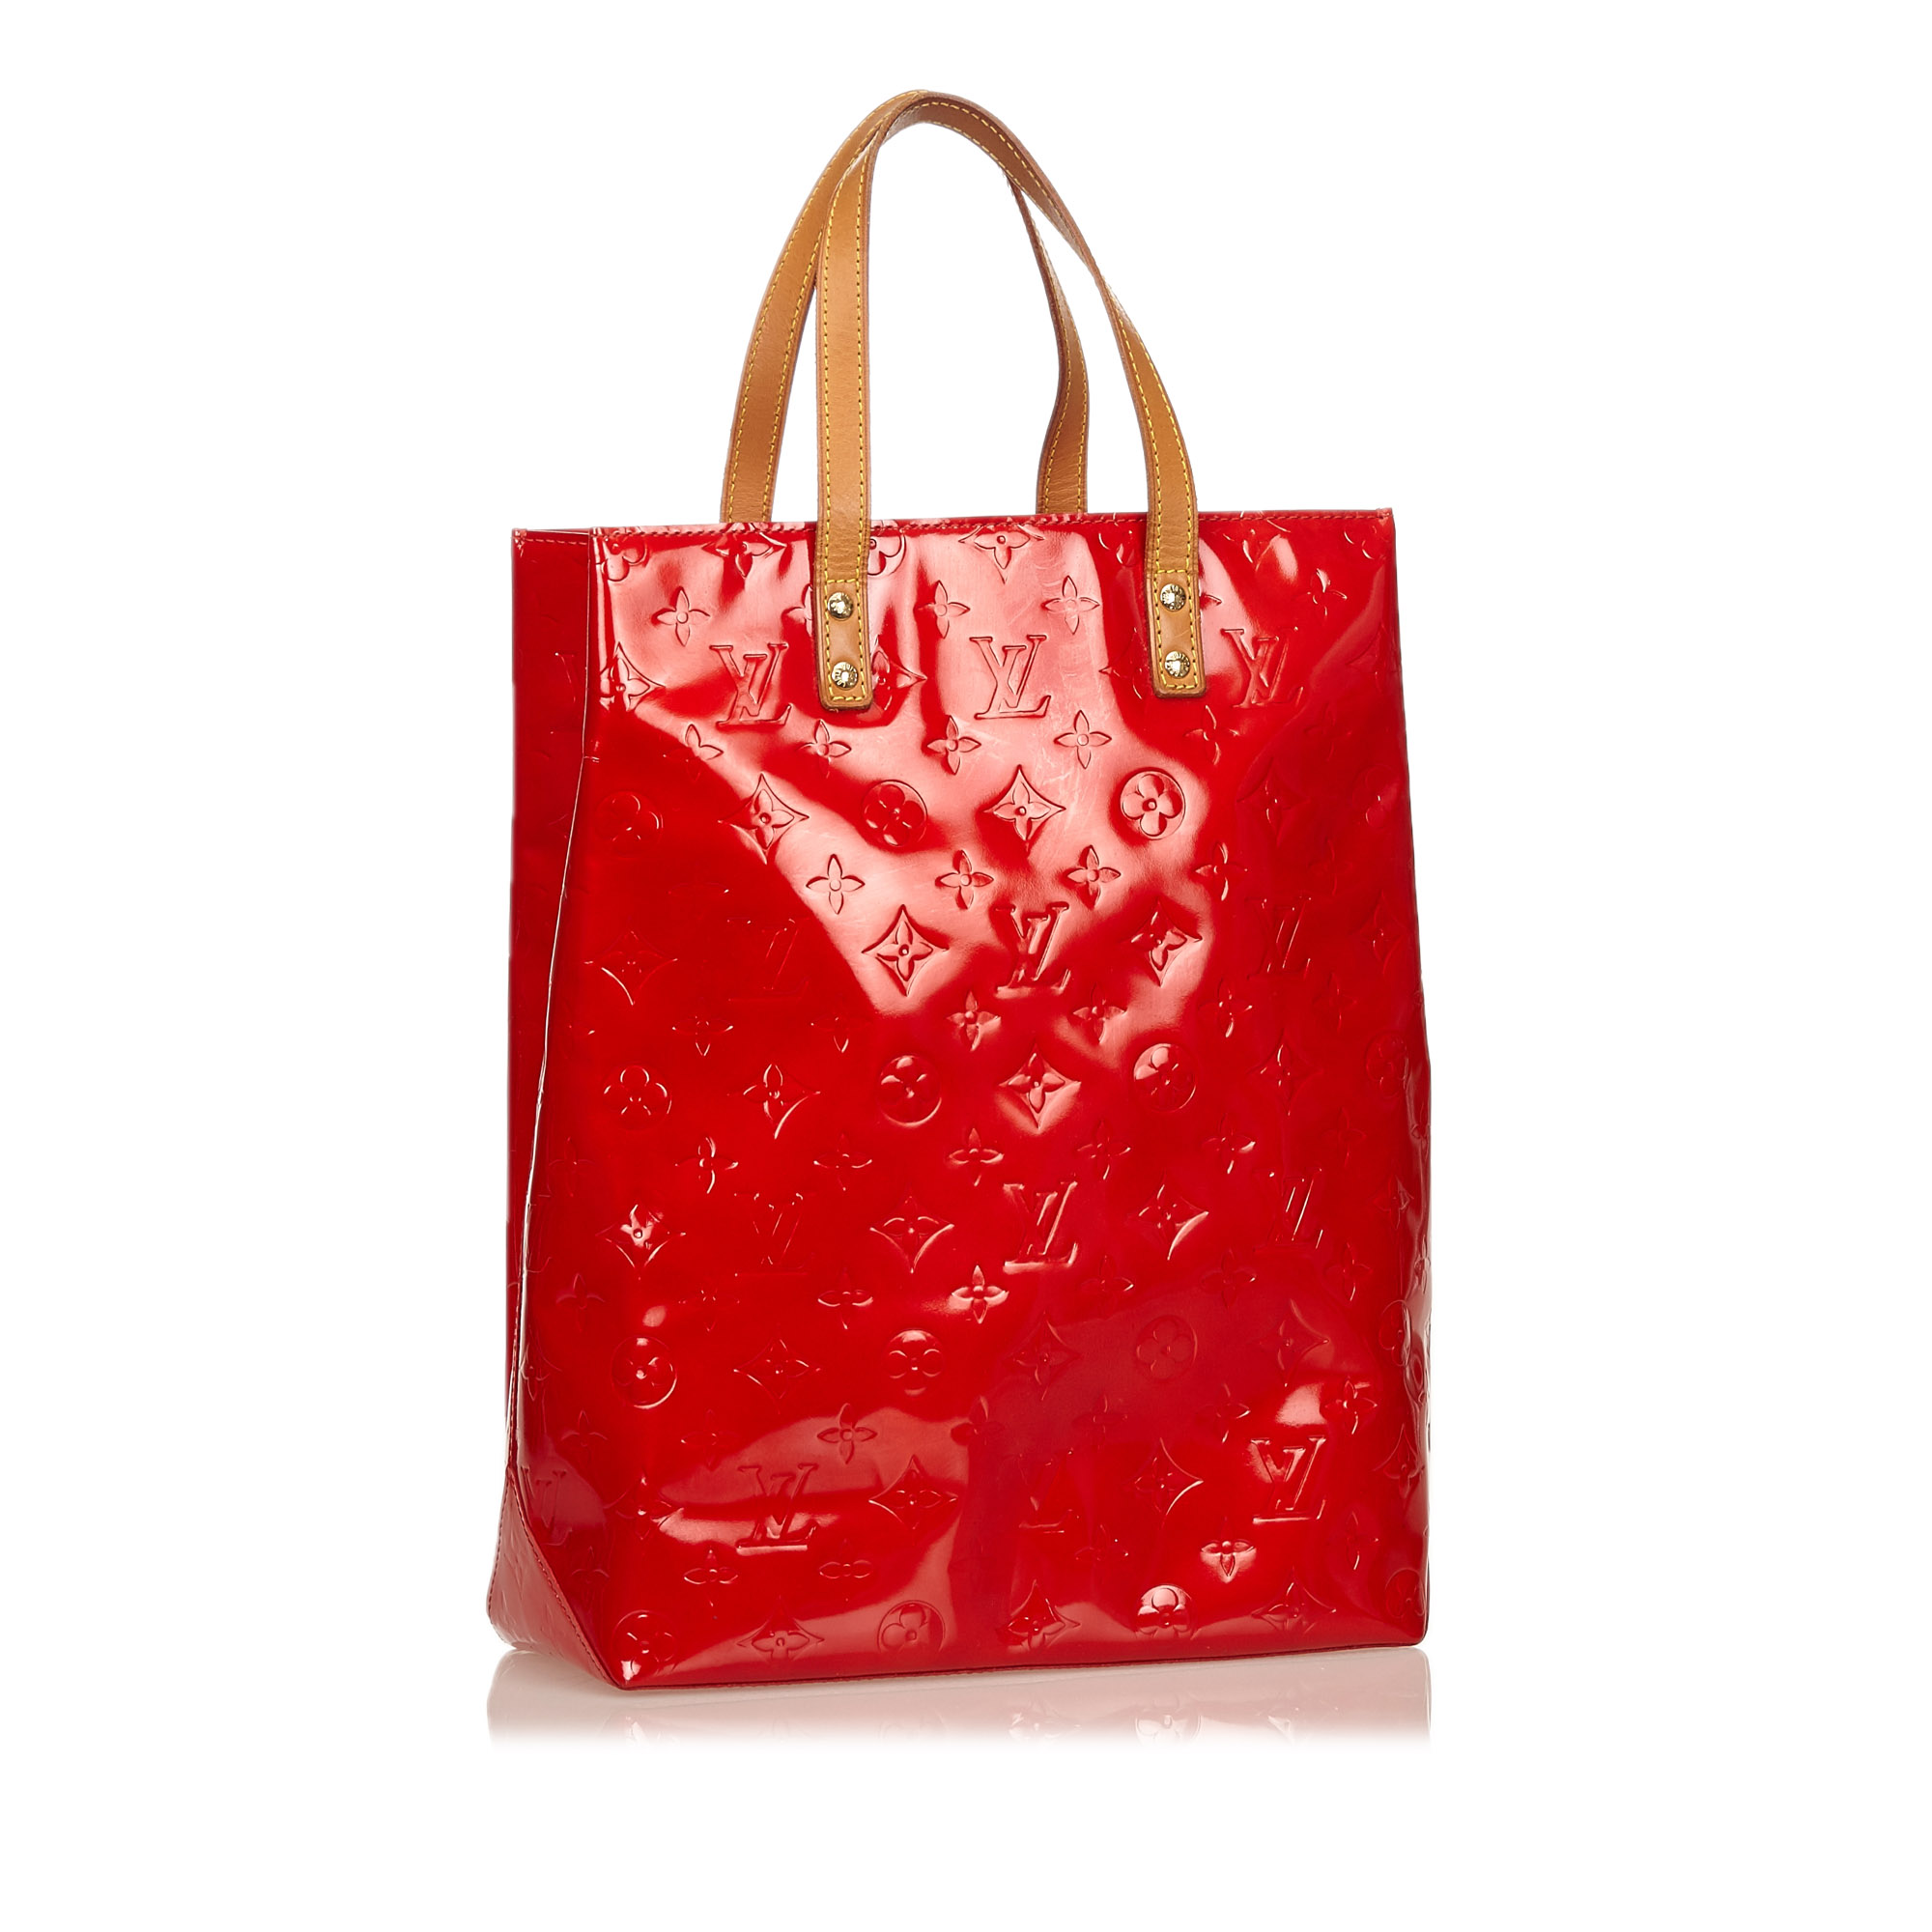 Louis Vuitton Red Vernis Reade MM